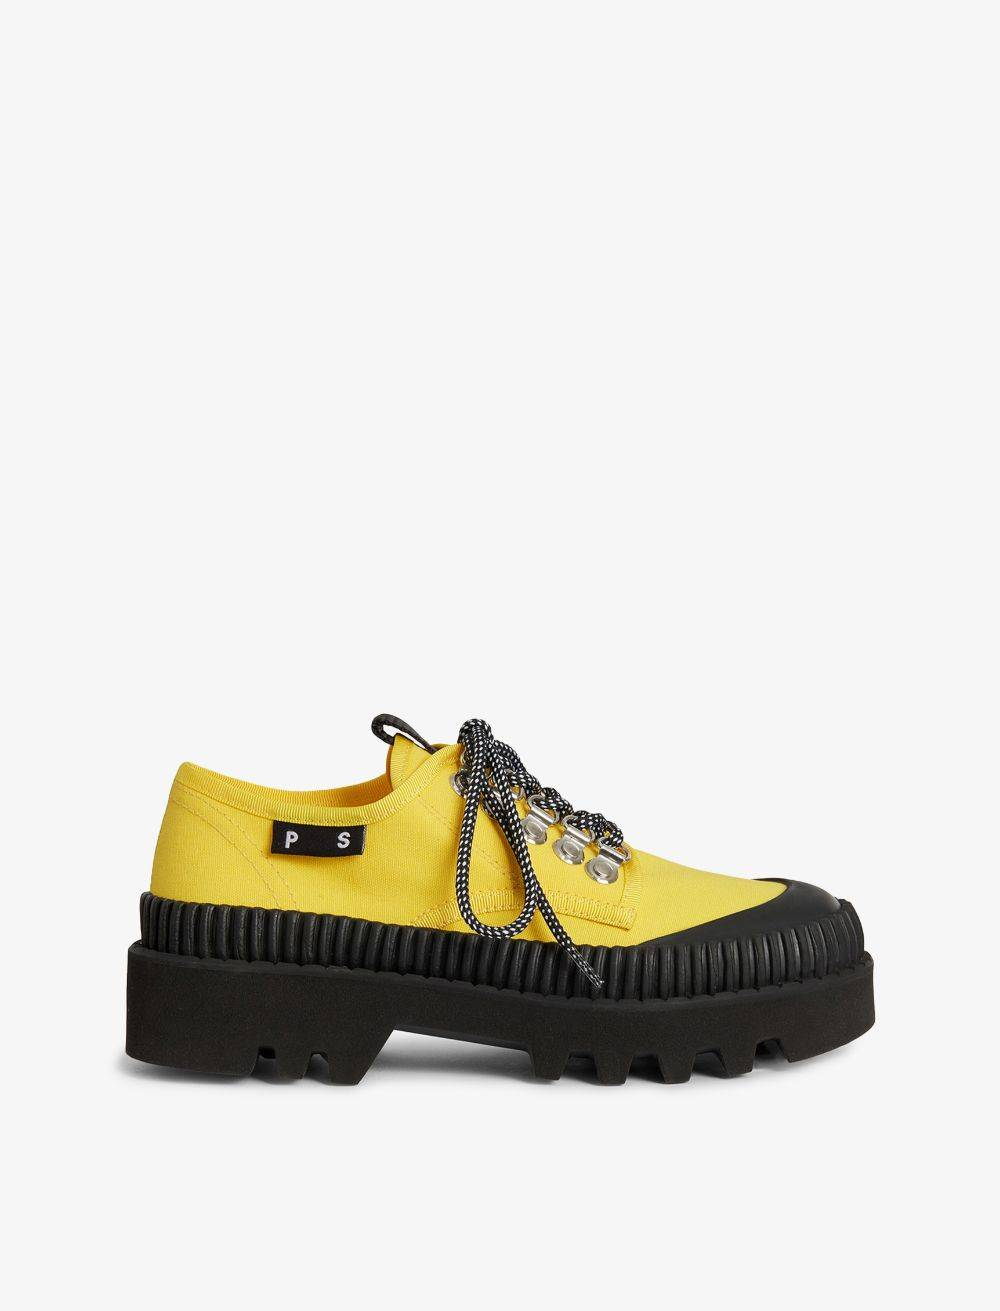 Proenza Schouler City Lug Sole Shoes 206 yellow 40